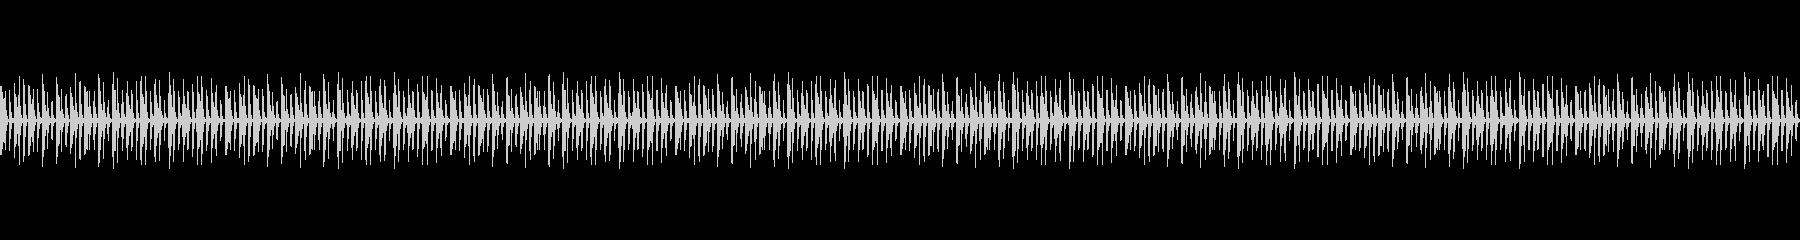 Vtuberの配信 雑談向けBGM(7)の未再生の波形